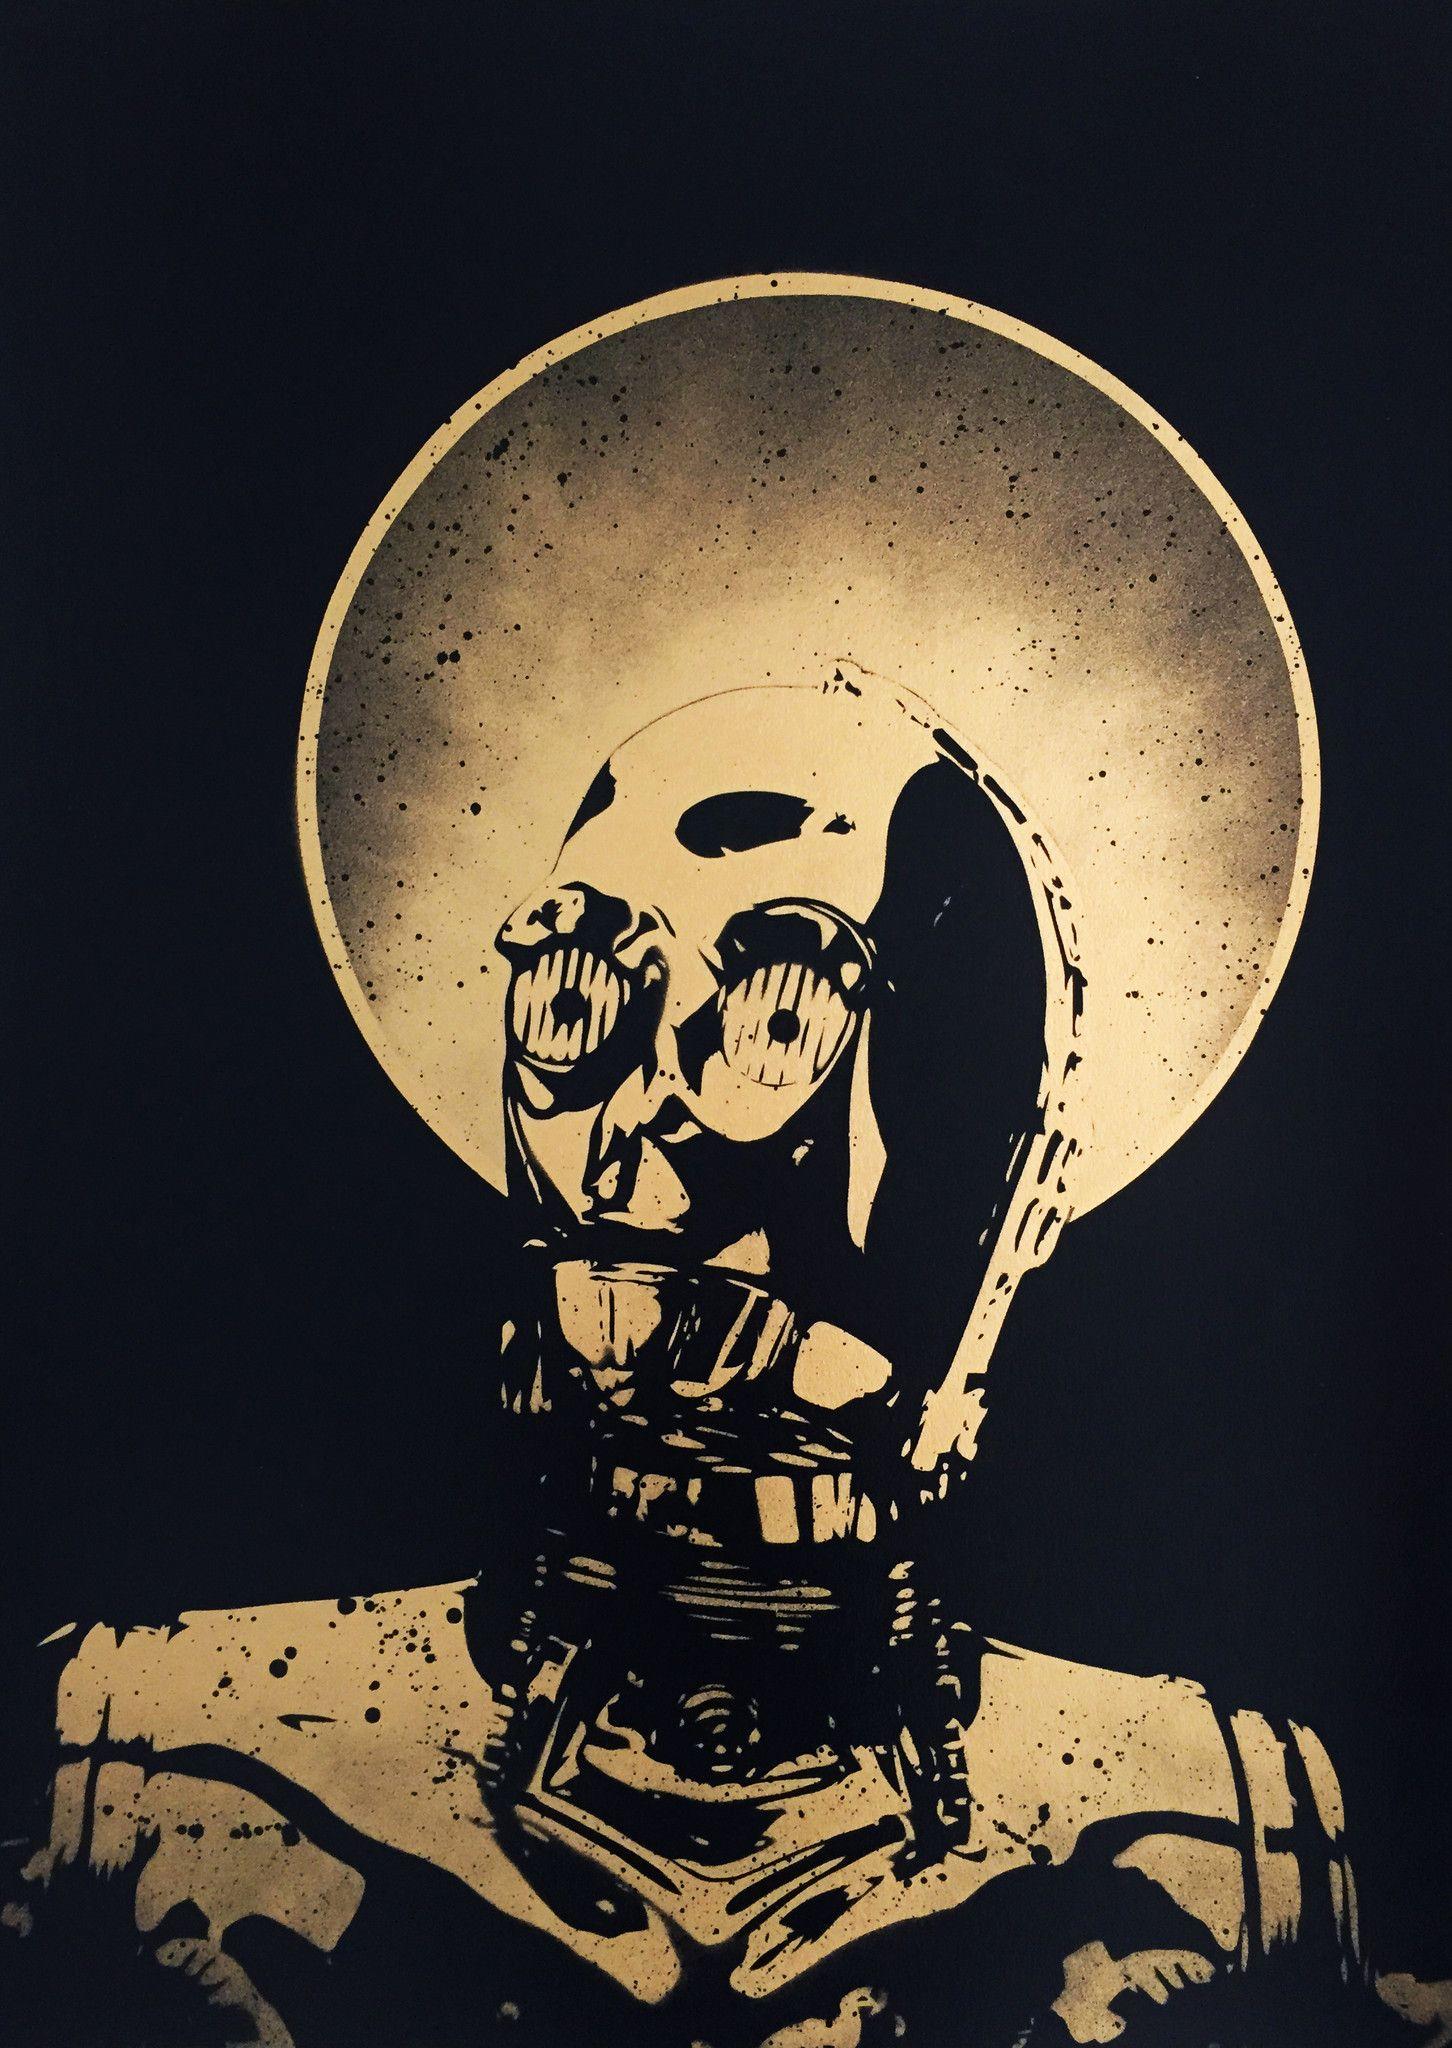 The false prophet (gold edition), Fake, limited, signed, Spraypaint, Stencil – prettyportal artshop, prints, urban art, streetart